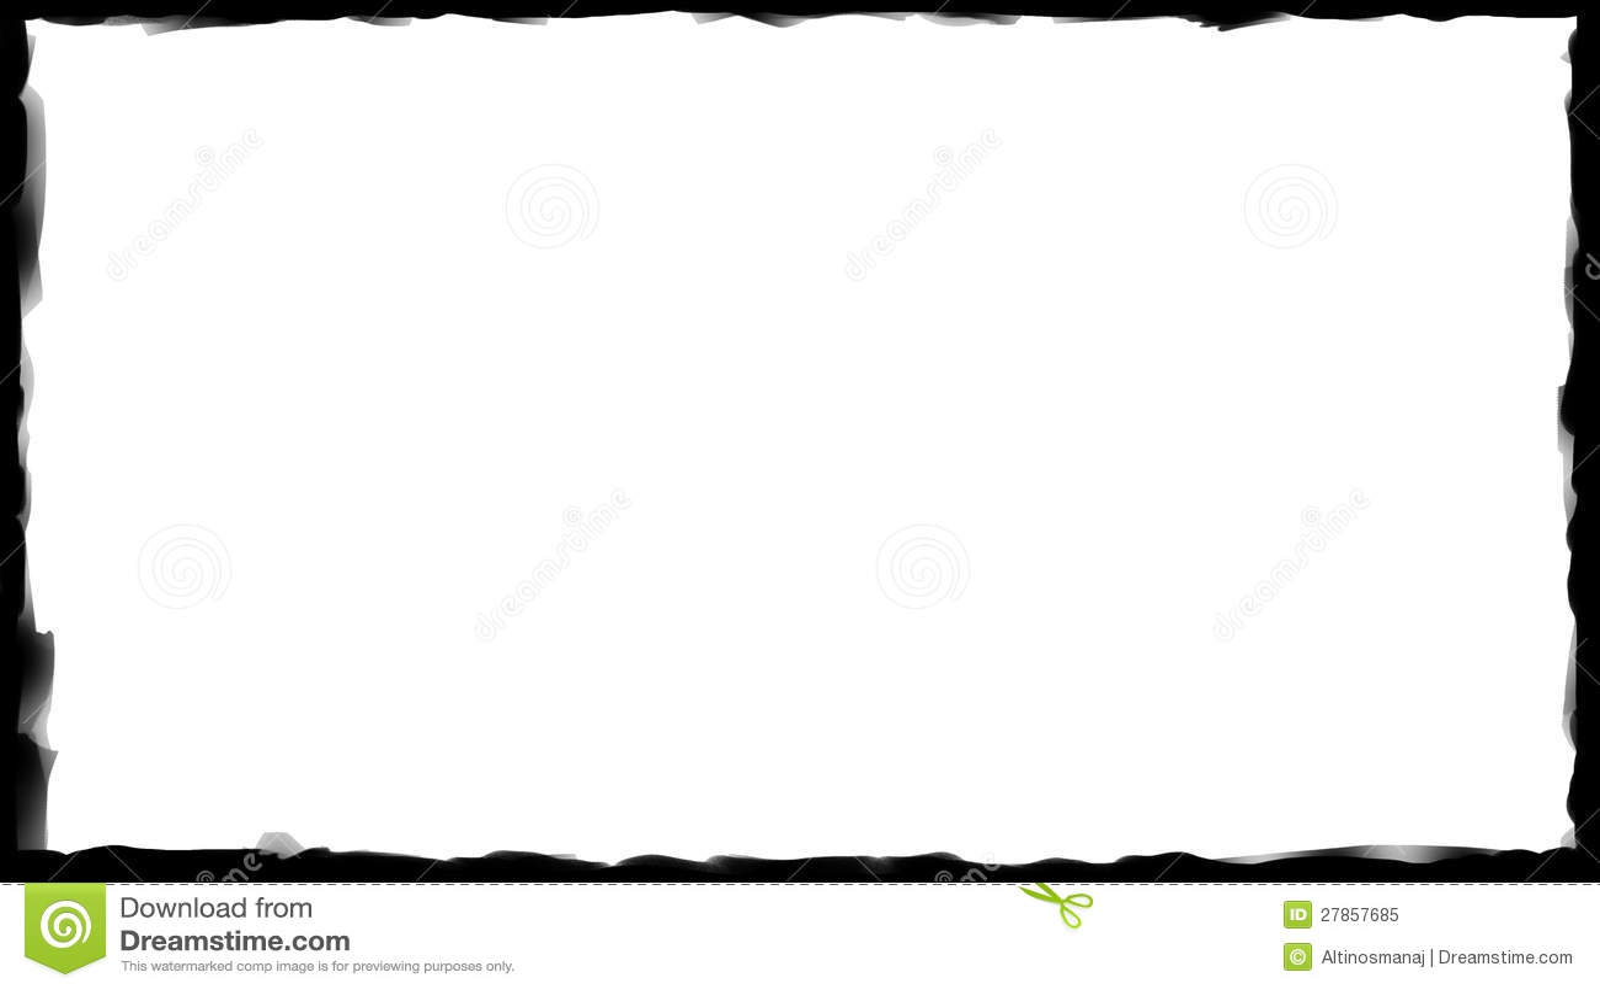 Black Border Frame - Brush Stroke 04 Stock Image - Image ...